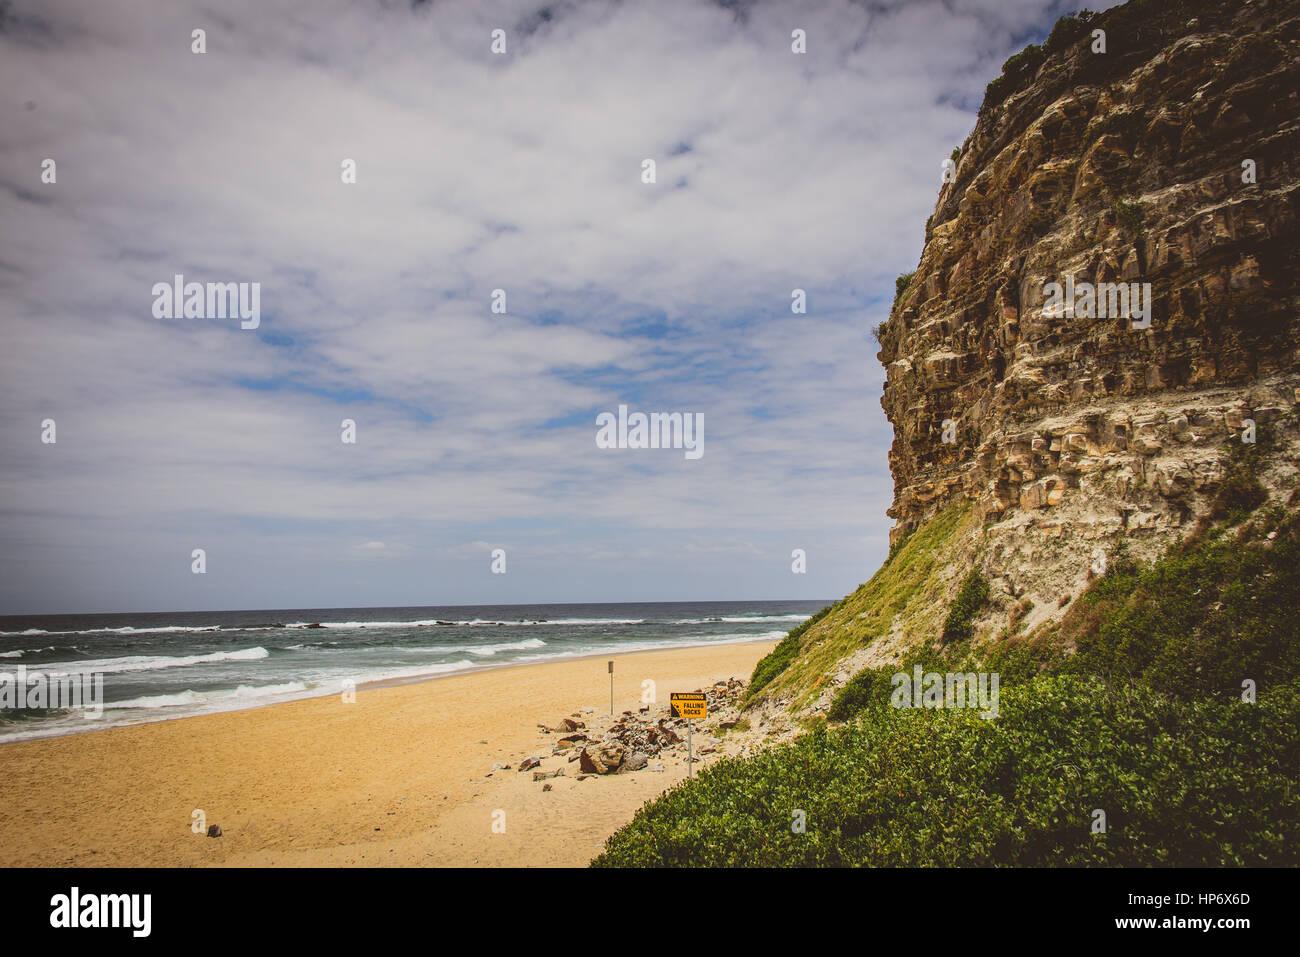 Nobby's Beach, Newcastle, Australia - Stock Image